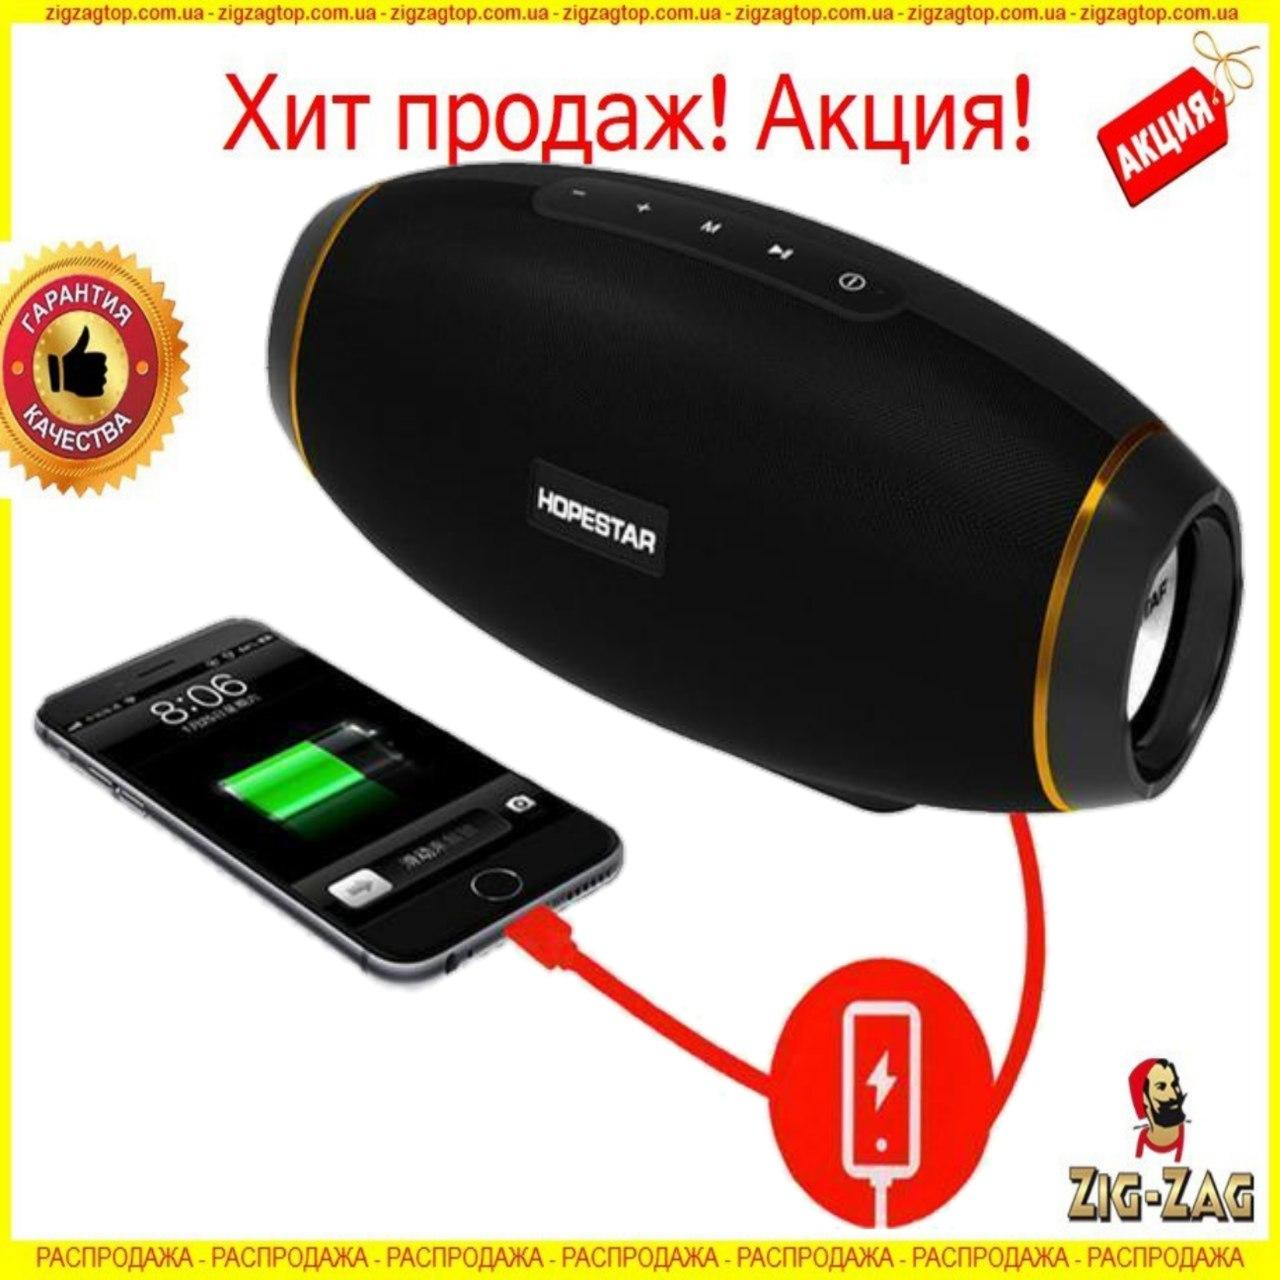 ОРИГИНАЛ Портативная колонка Hopestar H20 Bluetooth хопестар стерео сабвуфер Блютуз акустичиская система